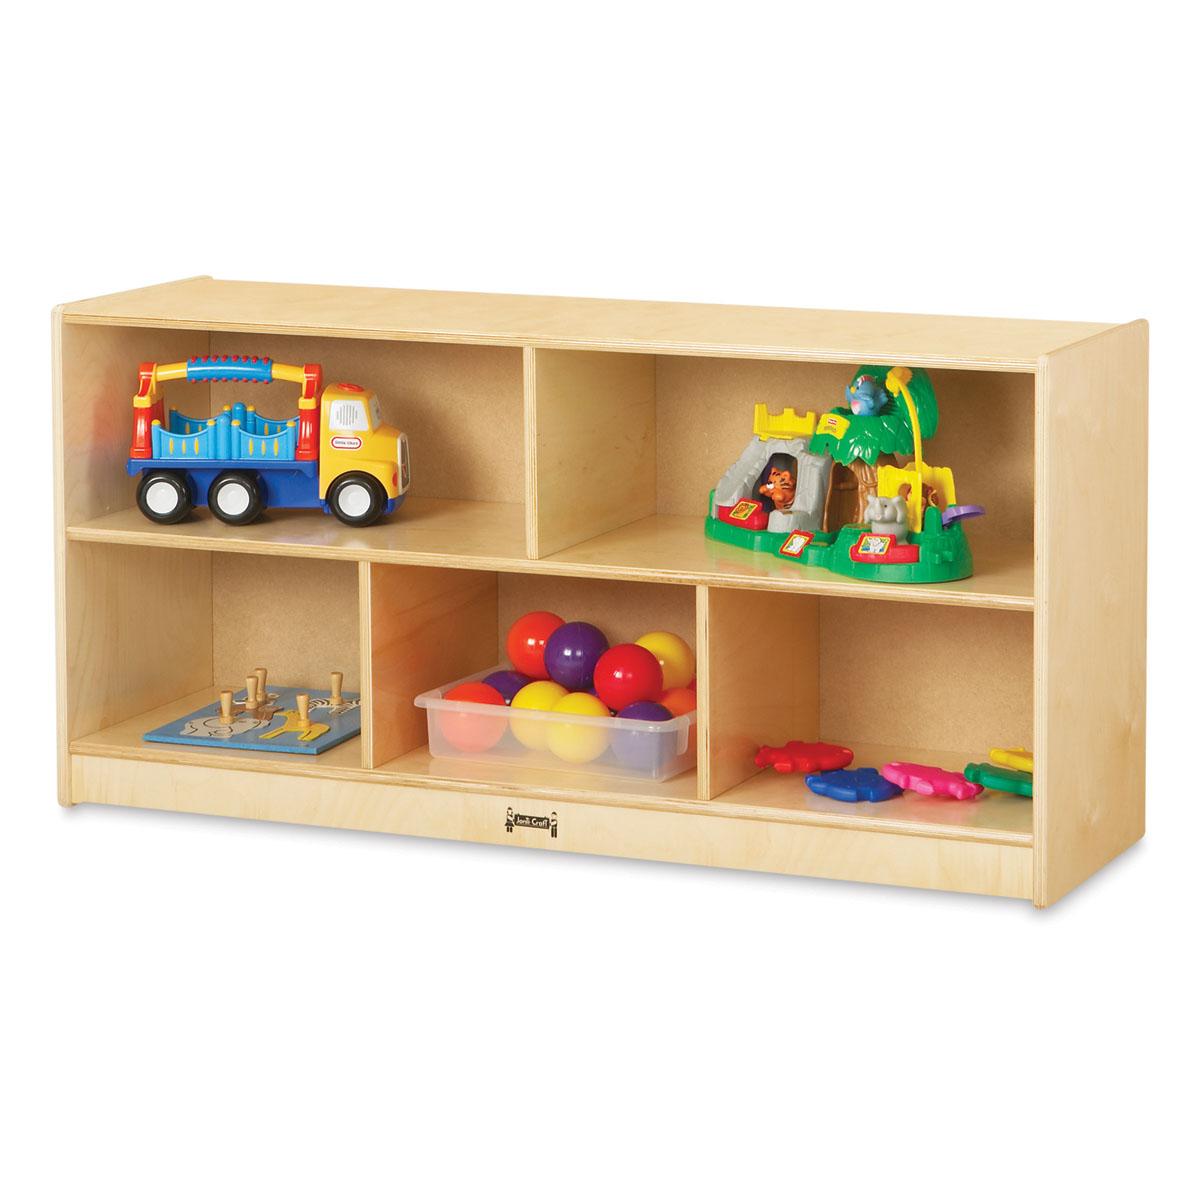 Jonti-Craft Mobile Storage Cabinet - Toddler Single